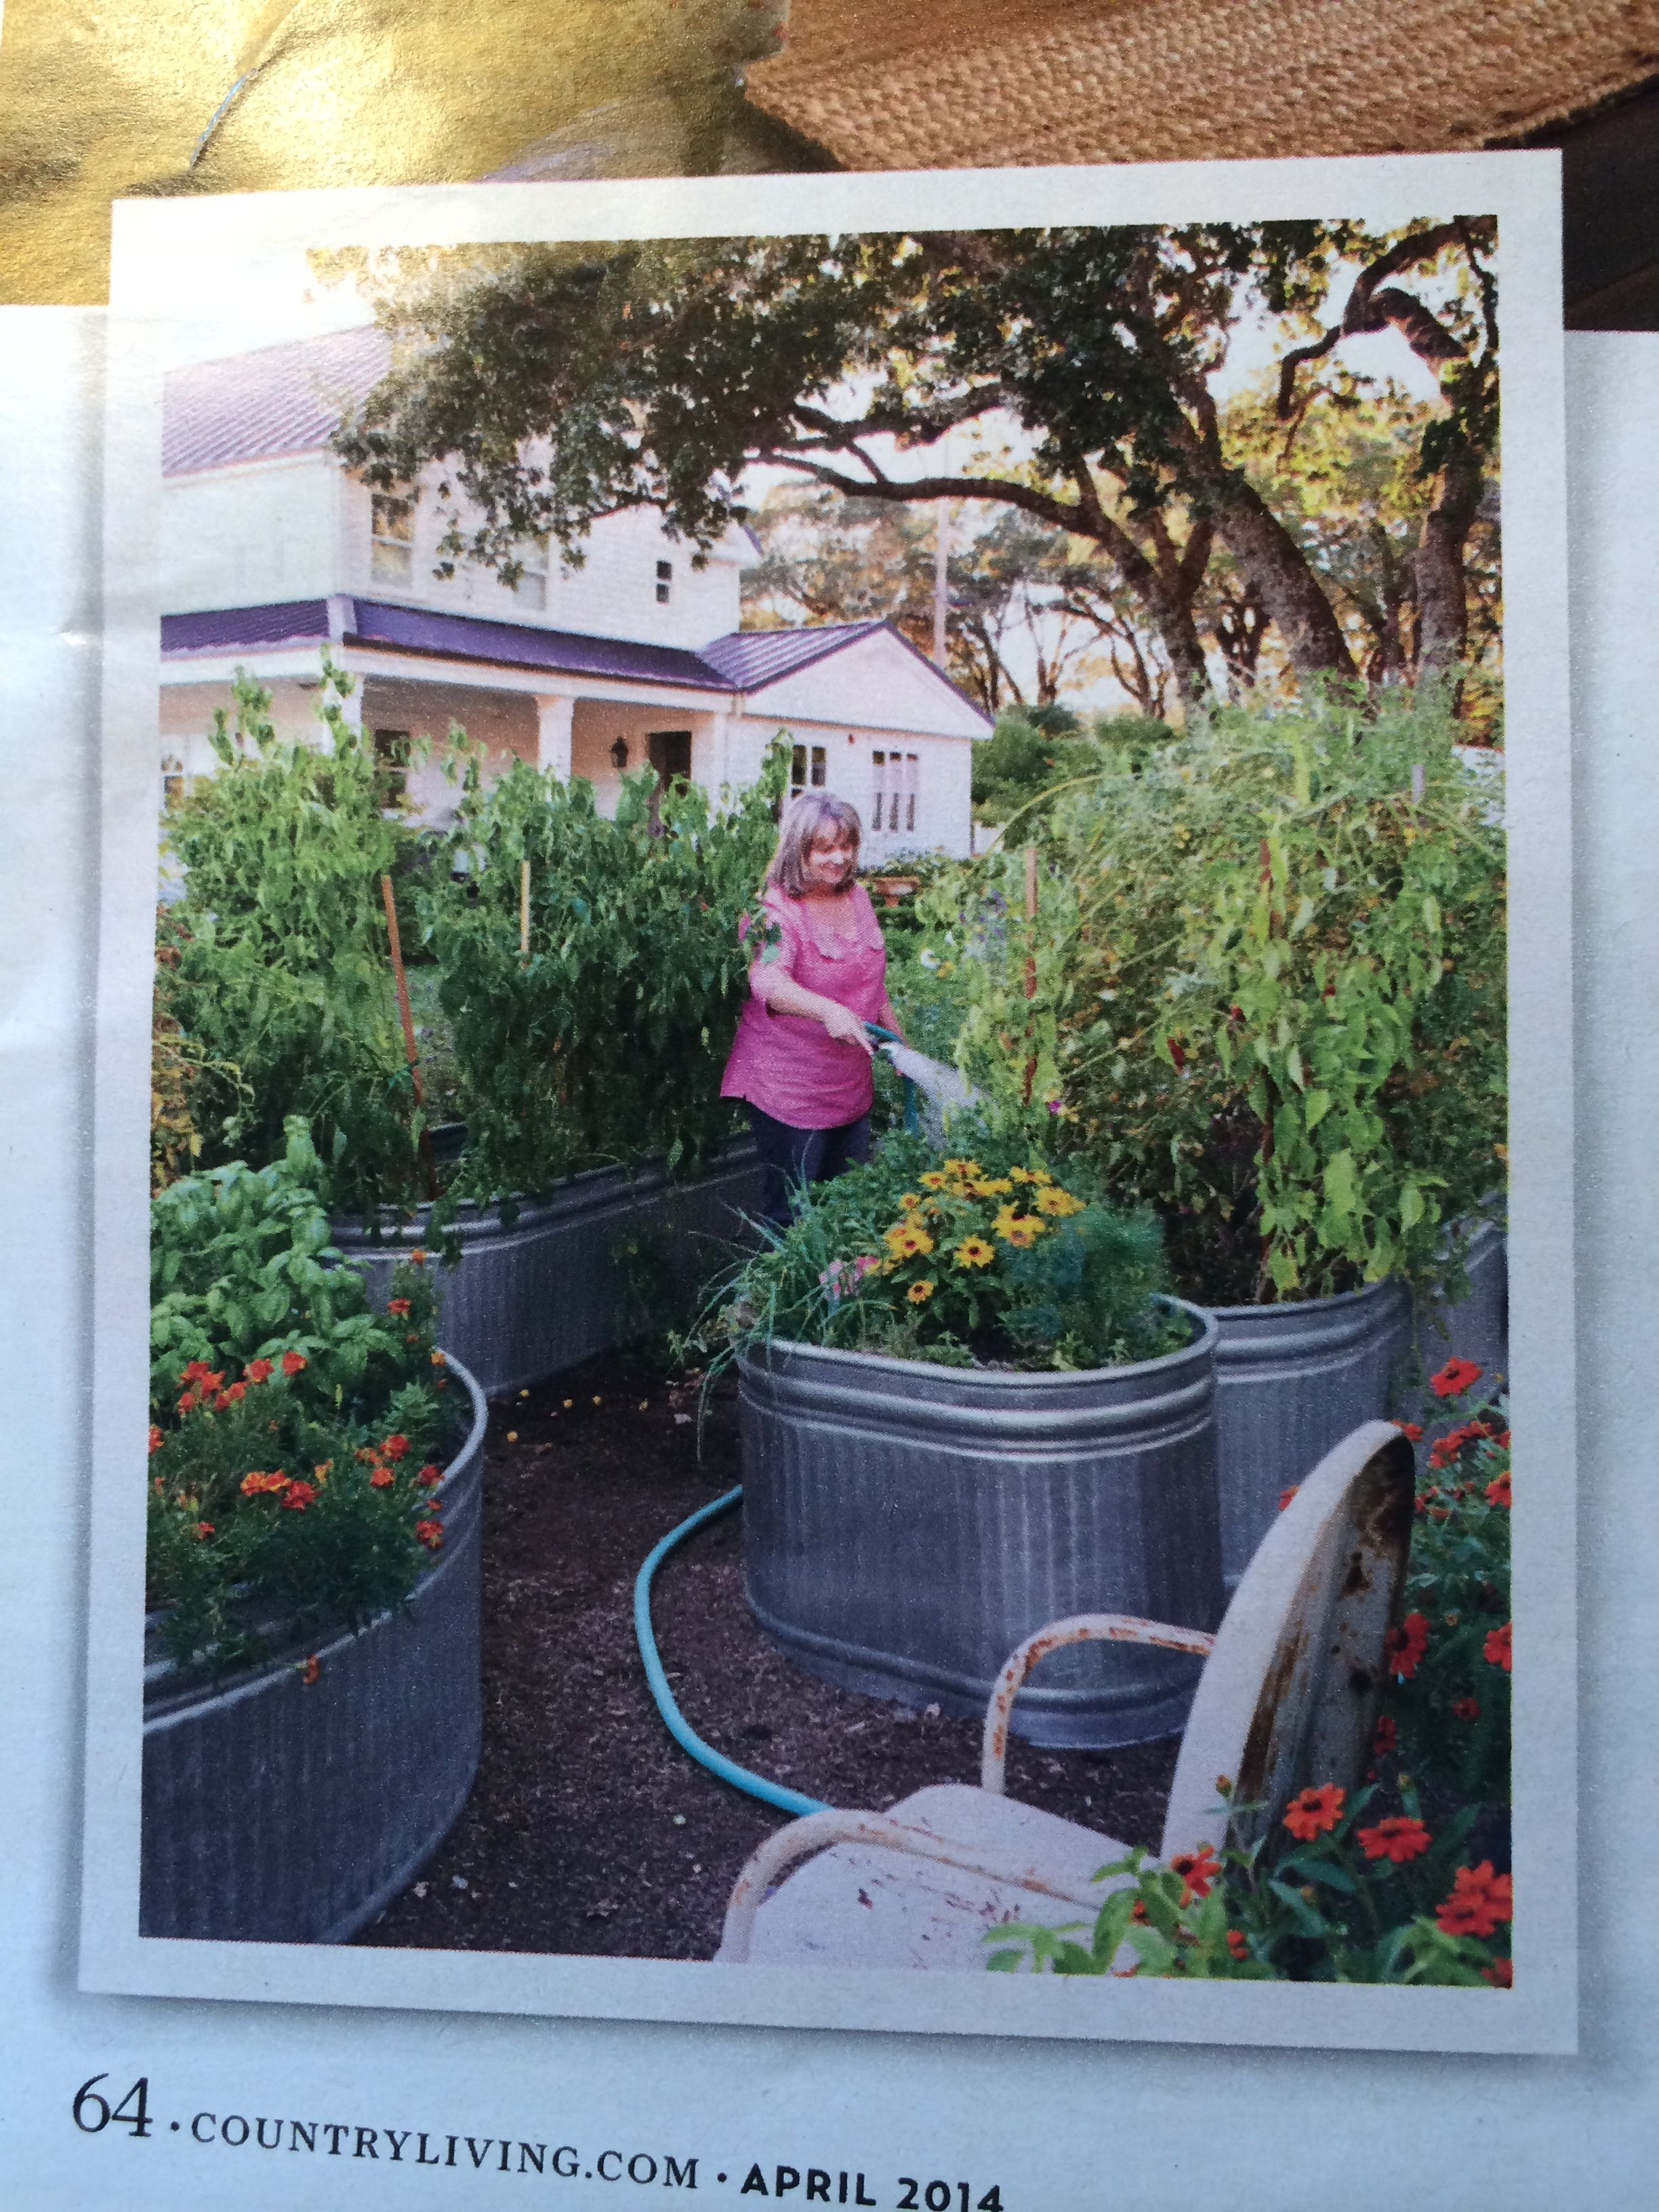 Galvanized troughs for oversized container garden idea